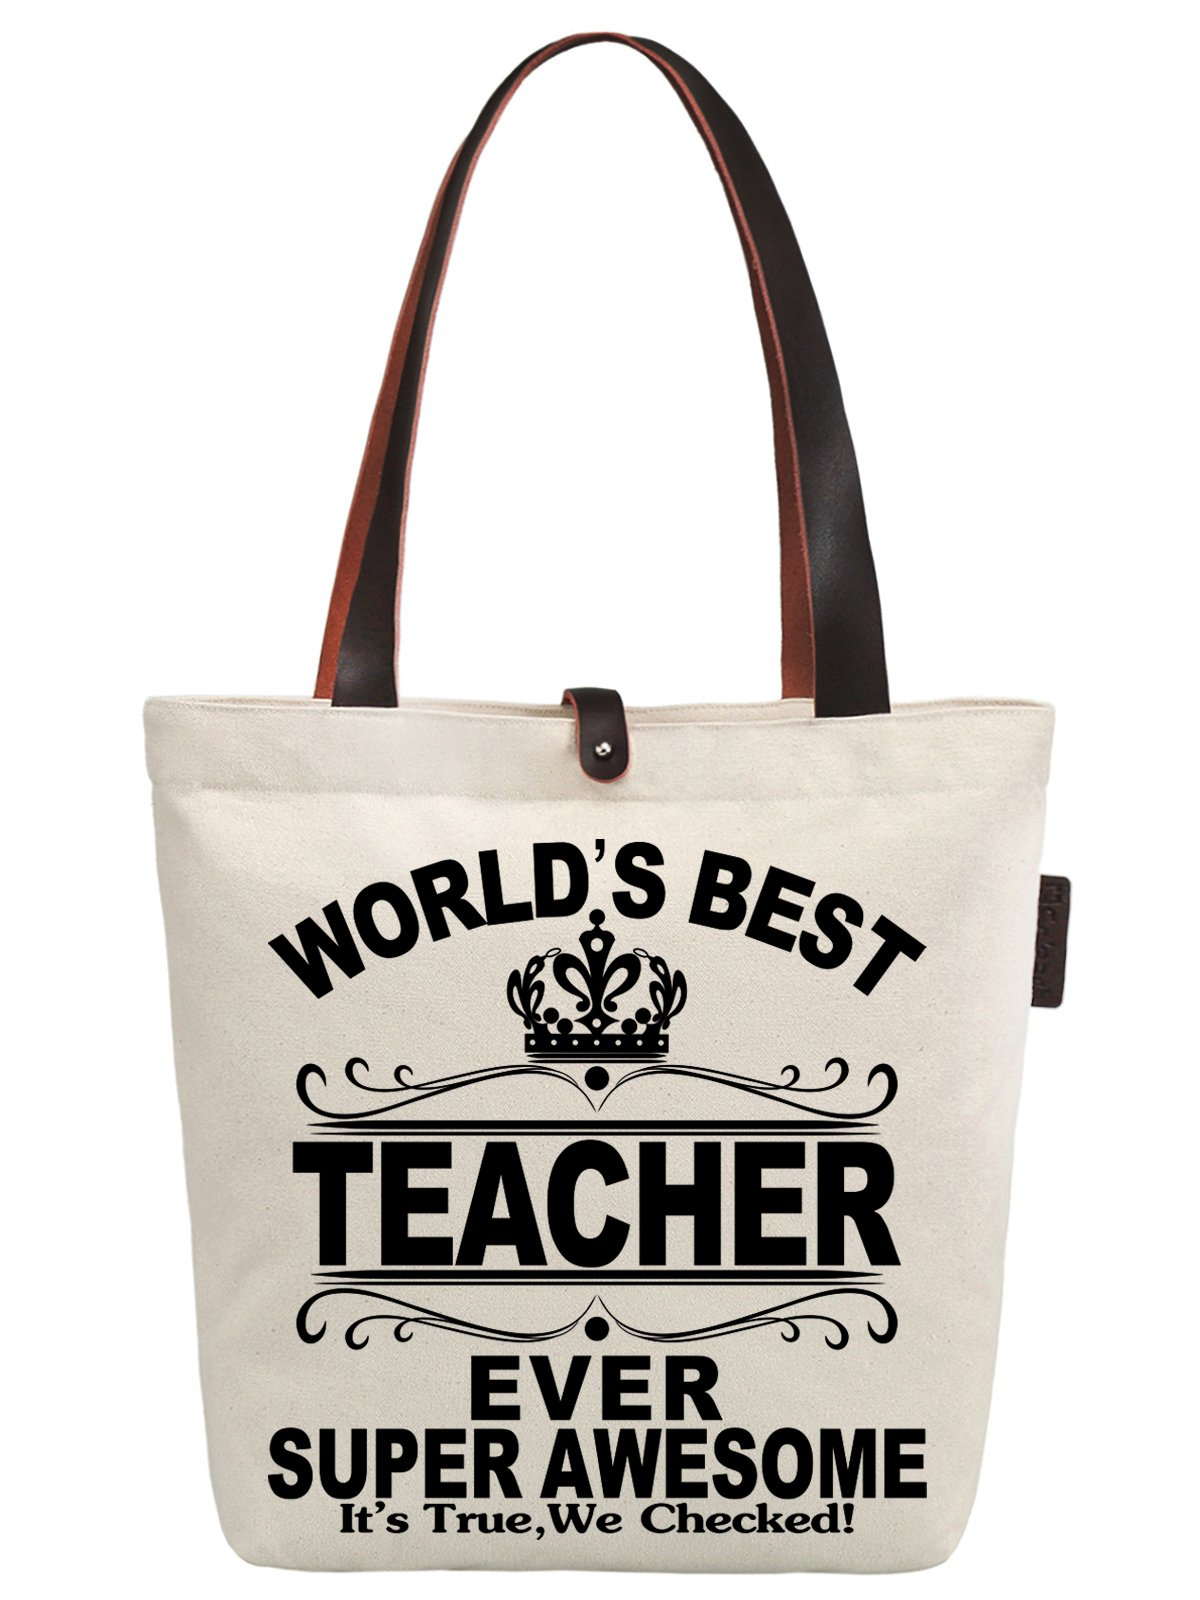 So'each Women's World's Best Teacher Ever Graphic Canvas Handbag Tote Shoulder Bag